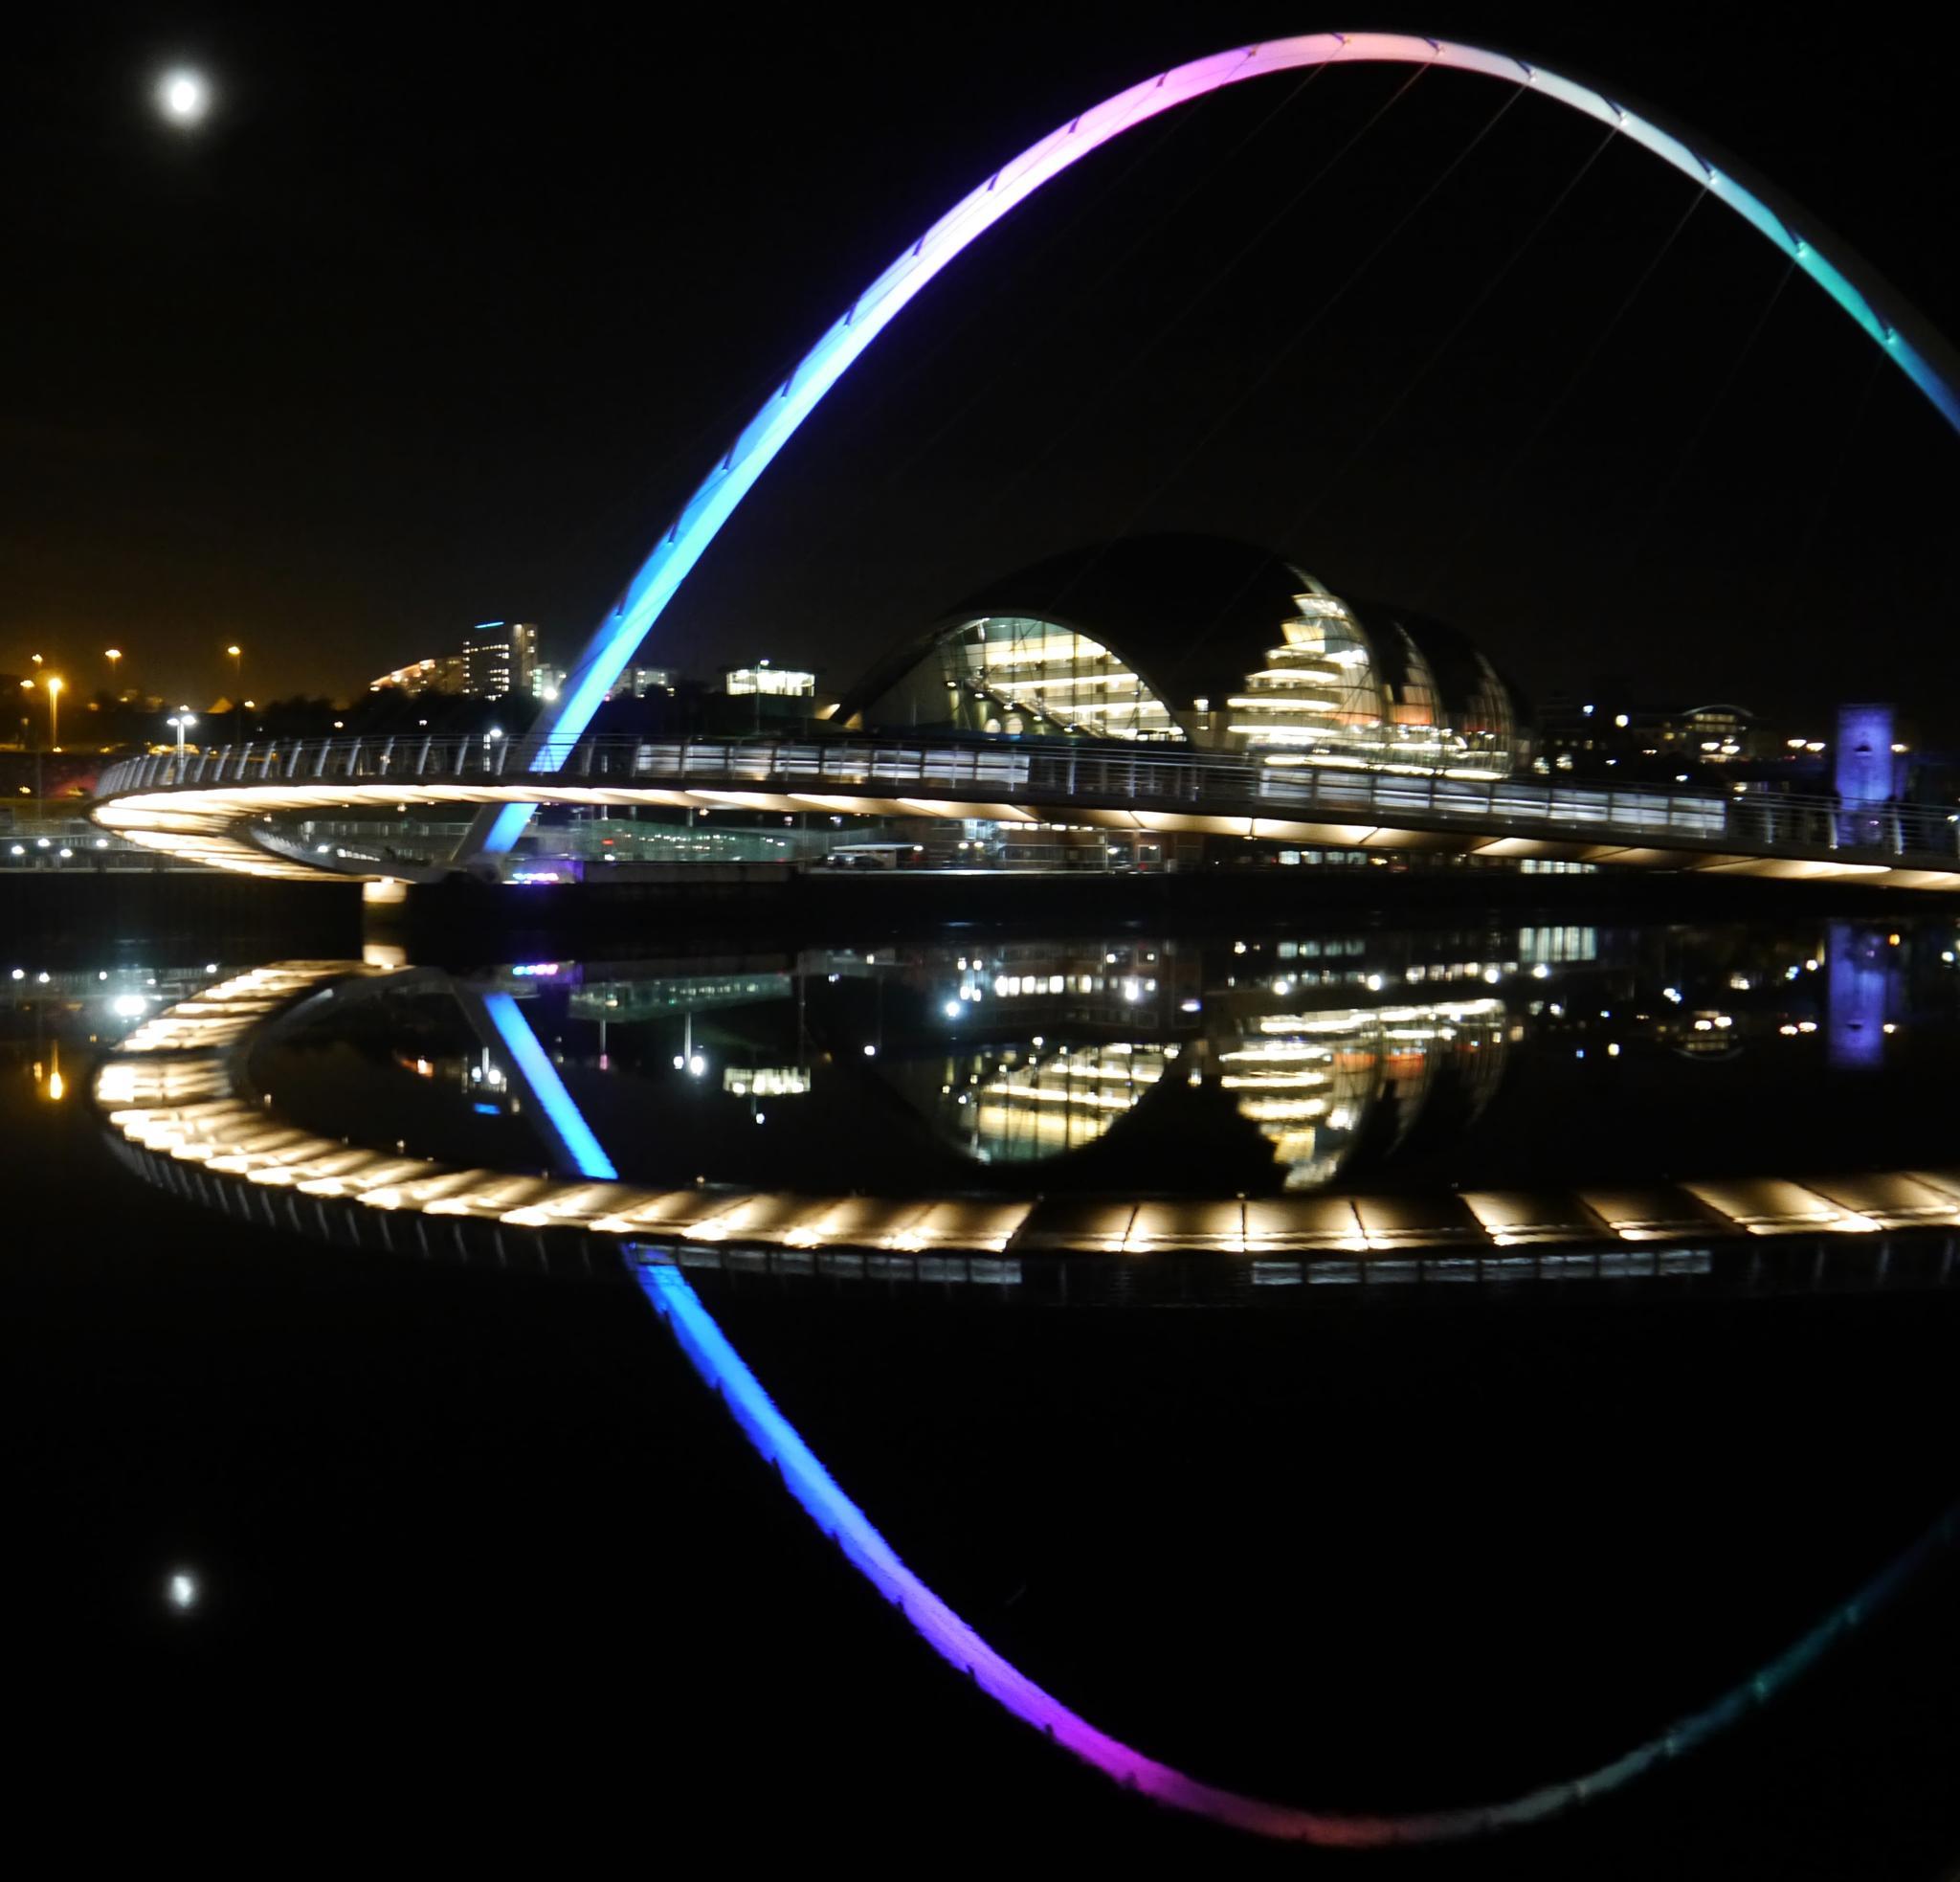 Gateshead Millennium Bridge and moon Reflection. by Darren Turner